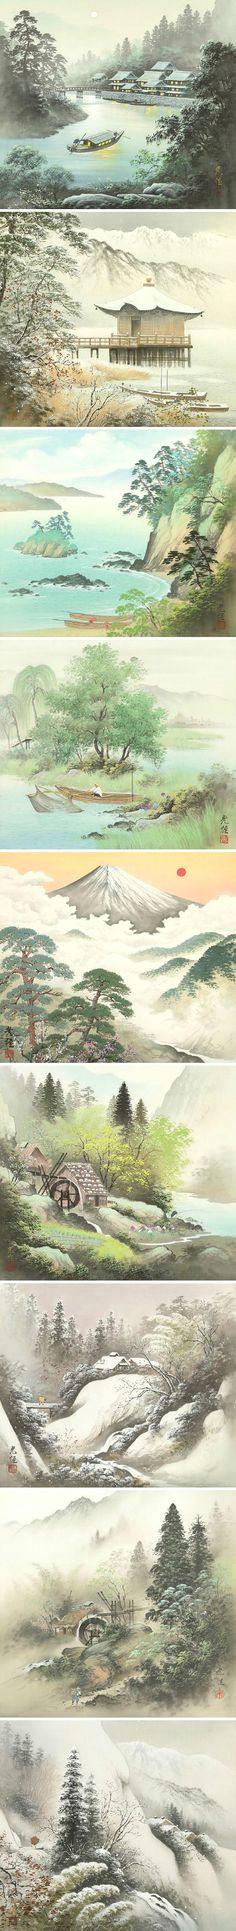 dc0e77d8dfd4313dbead41b651bacbd9 japanese painting chinese painting jpg